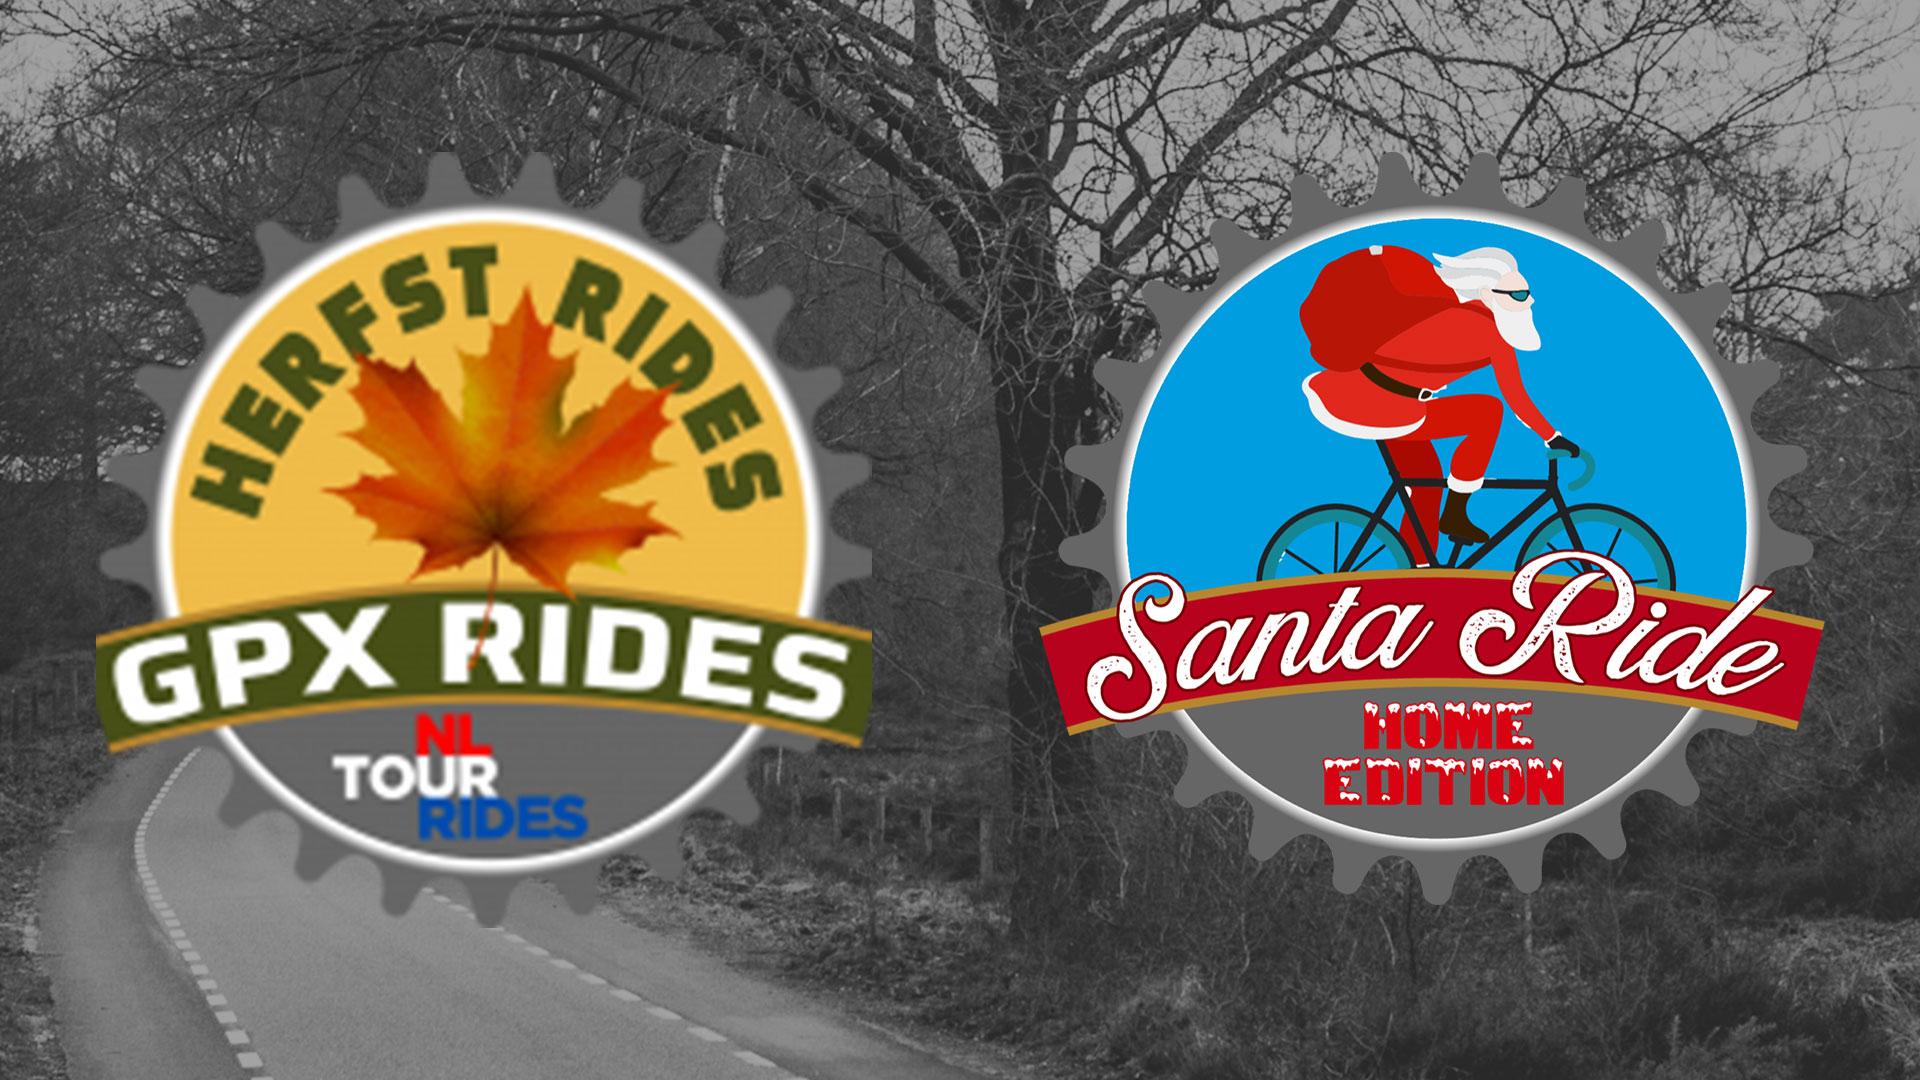 NL Tour Rides herfst ride (review) en Santa ride (preview)